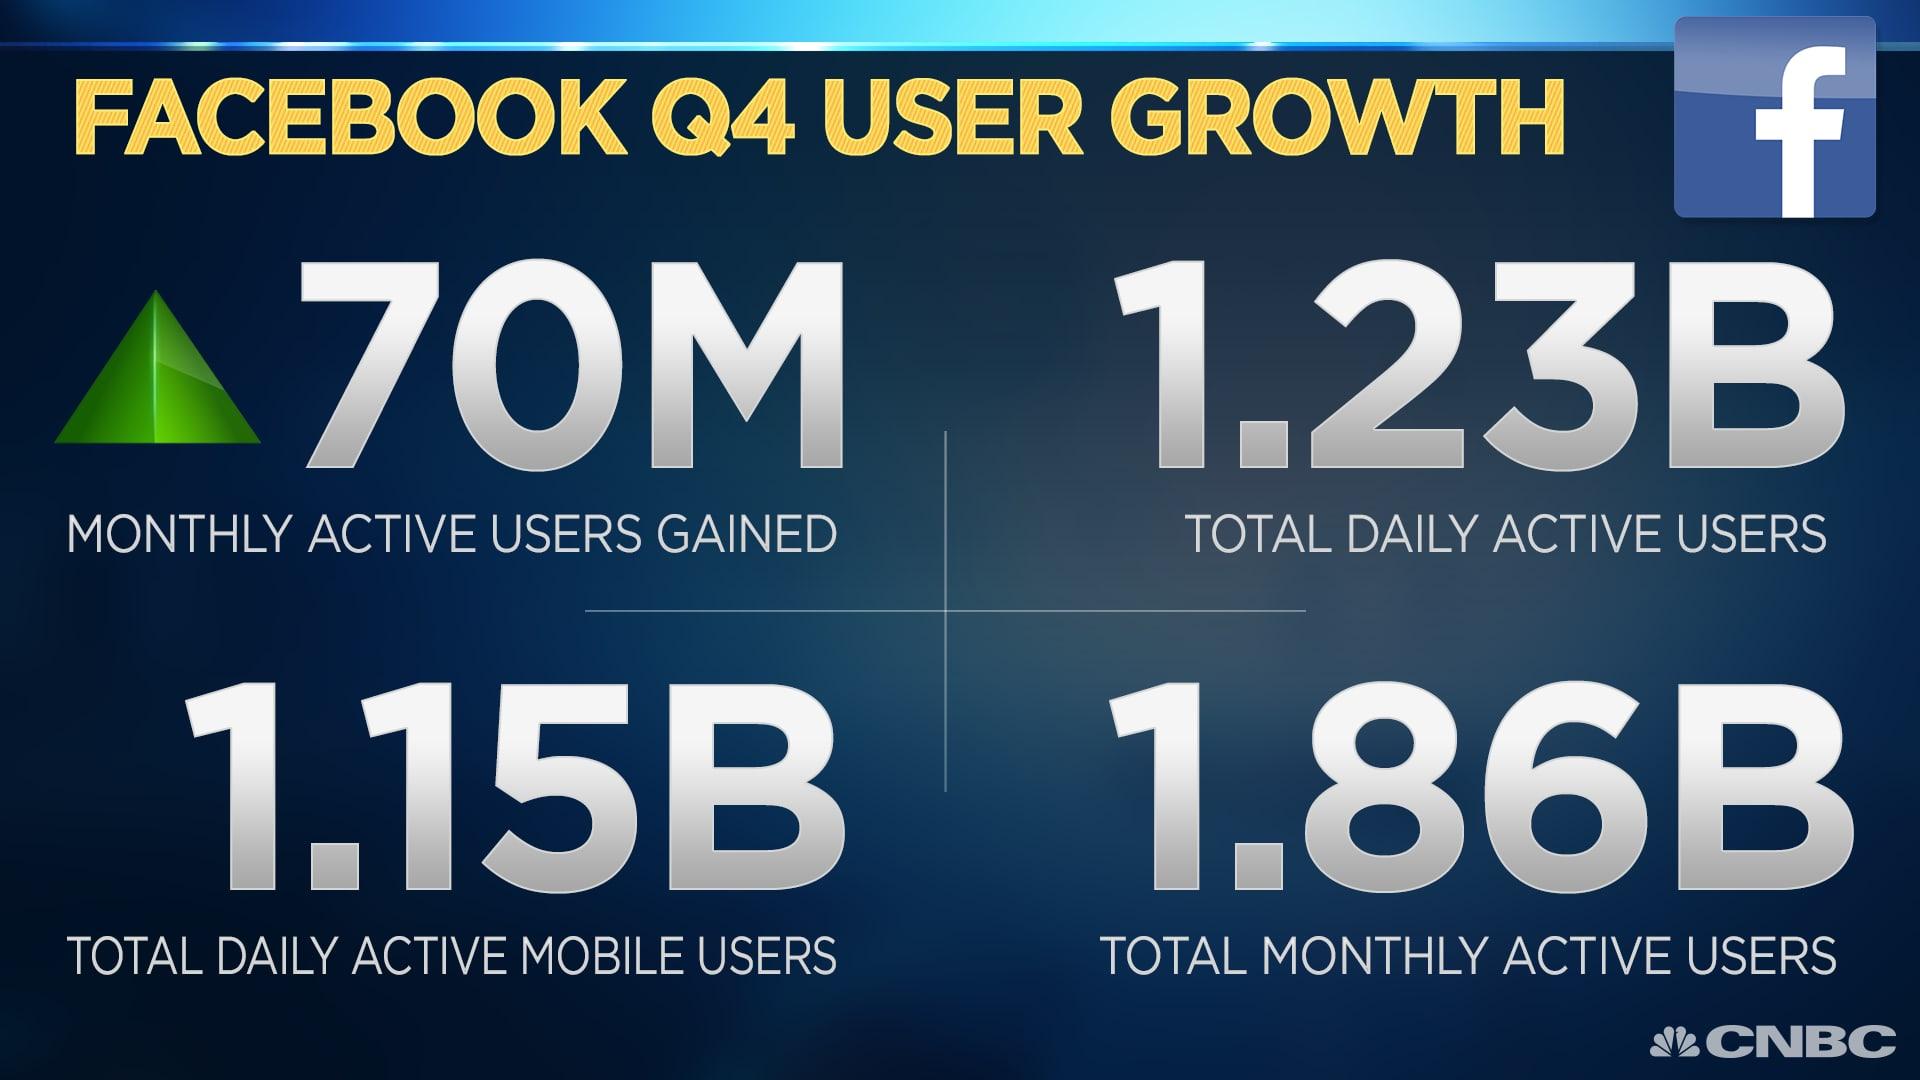 CNBC: Facebook user growth